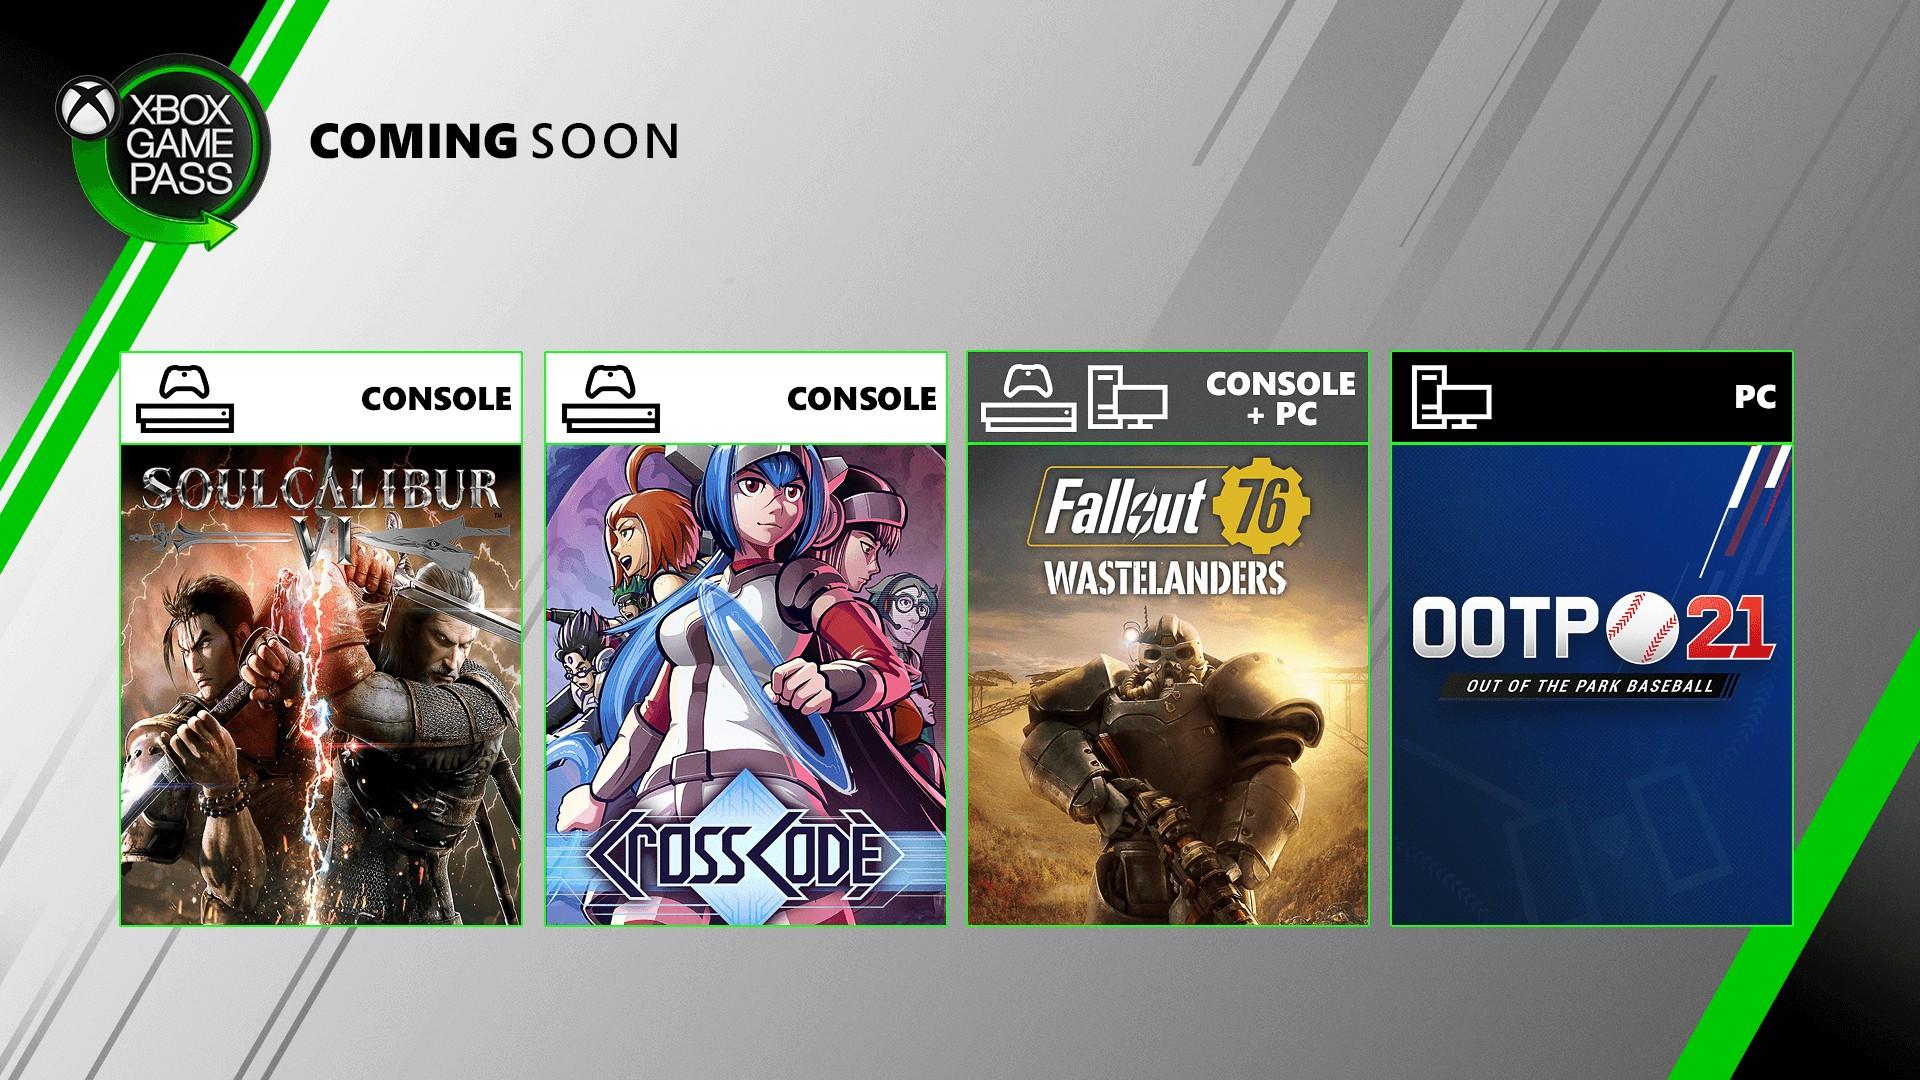 xbox game pass july update